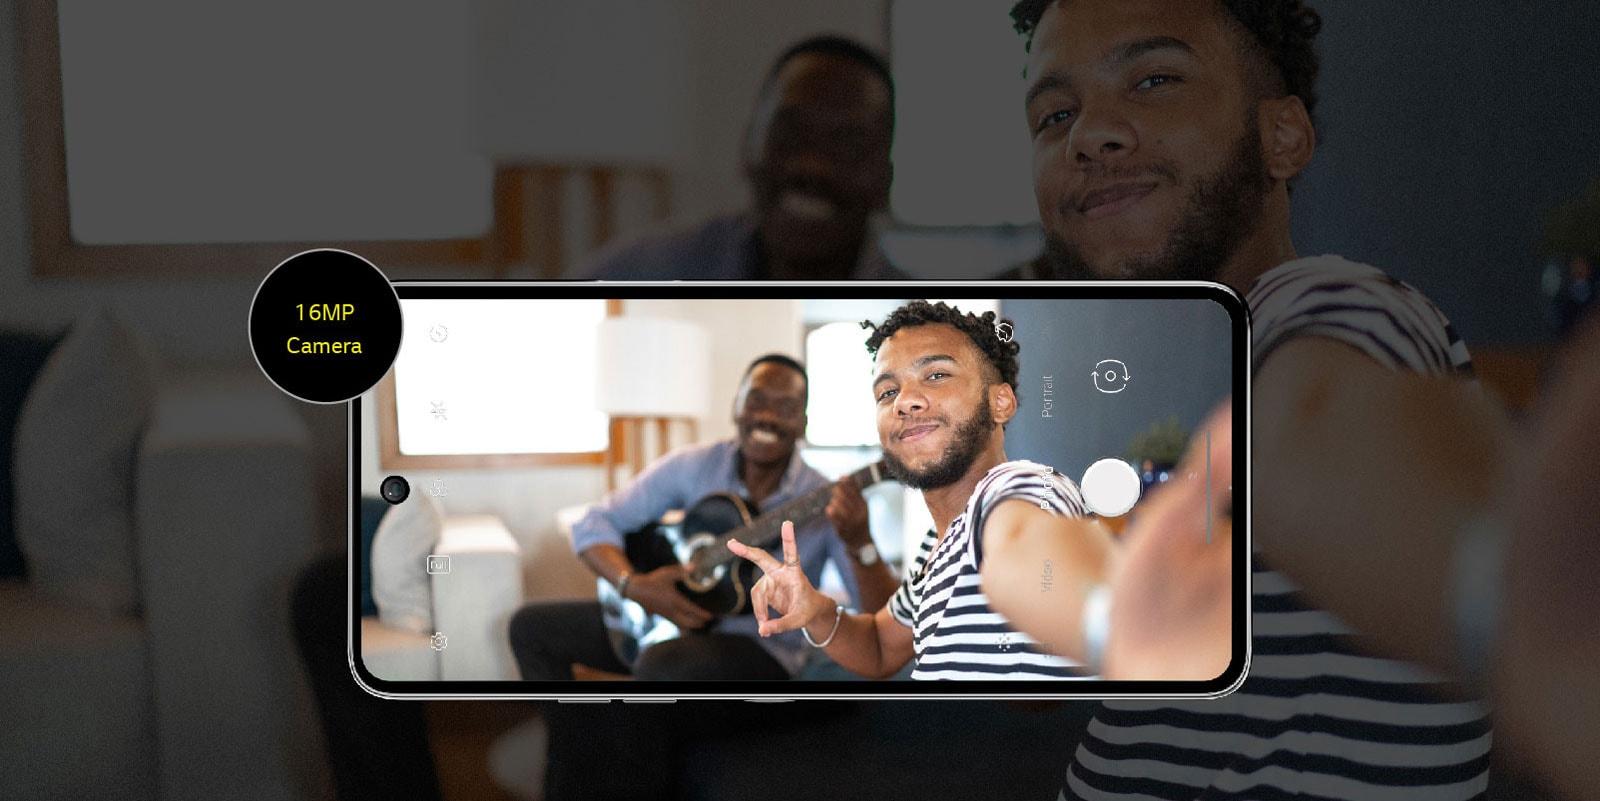 Image showing two men taking a selfie